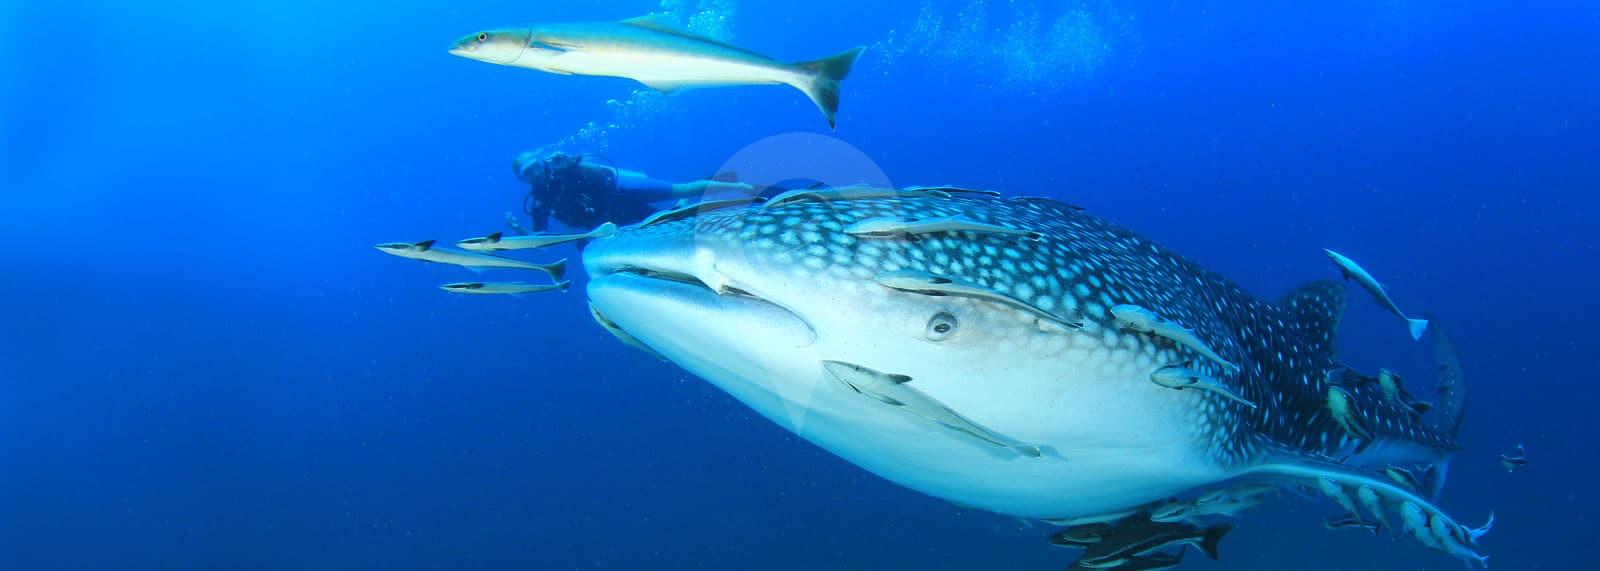 Galapagos Diving Day Tours & Programs